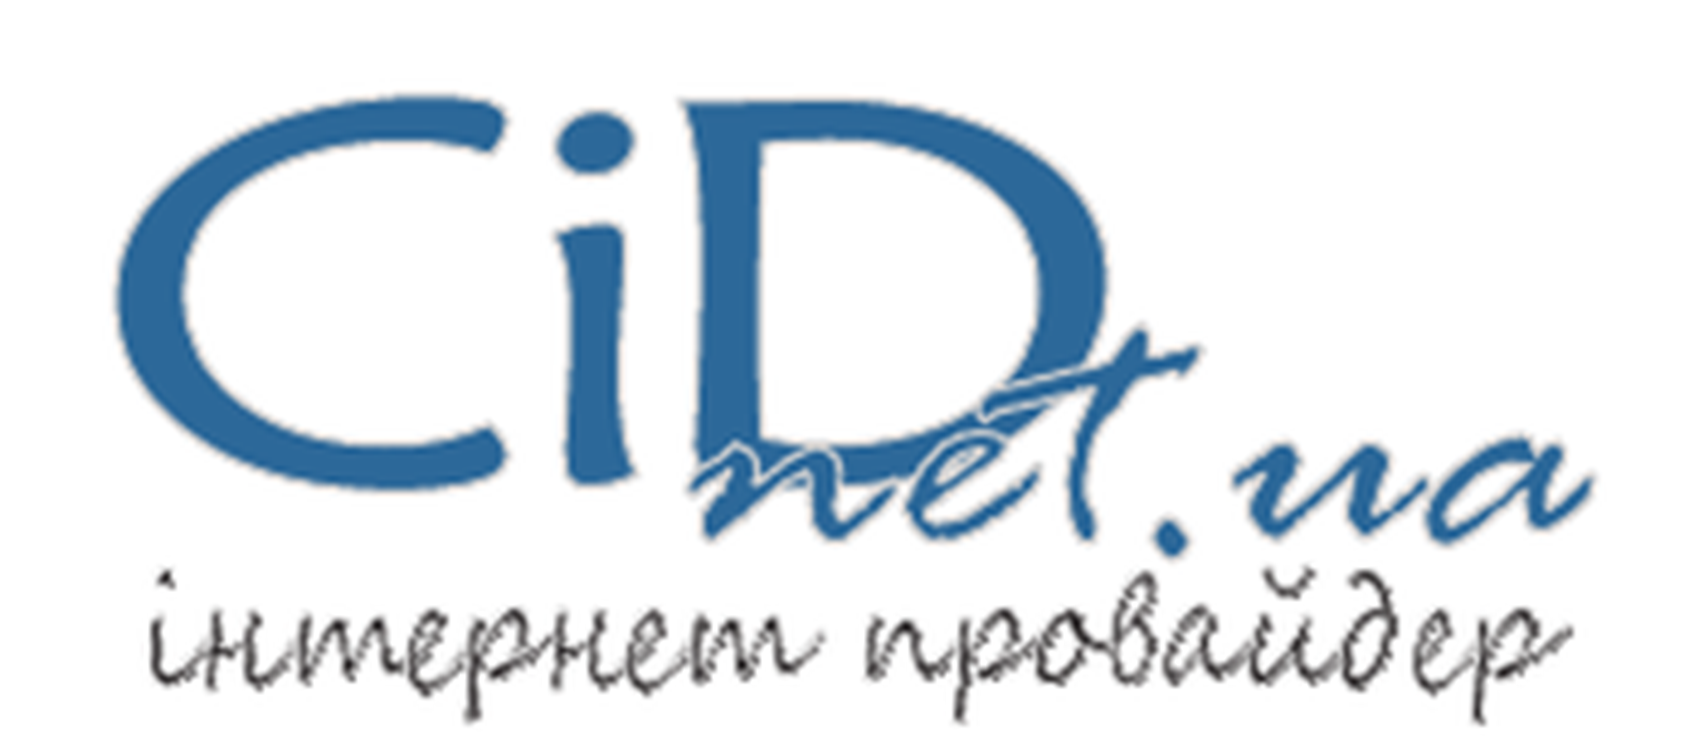 Cid.net.ua - UID  (Киев)